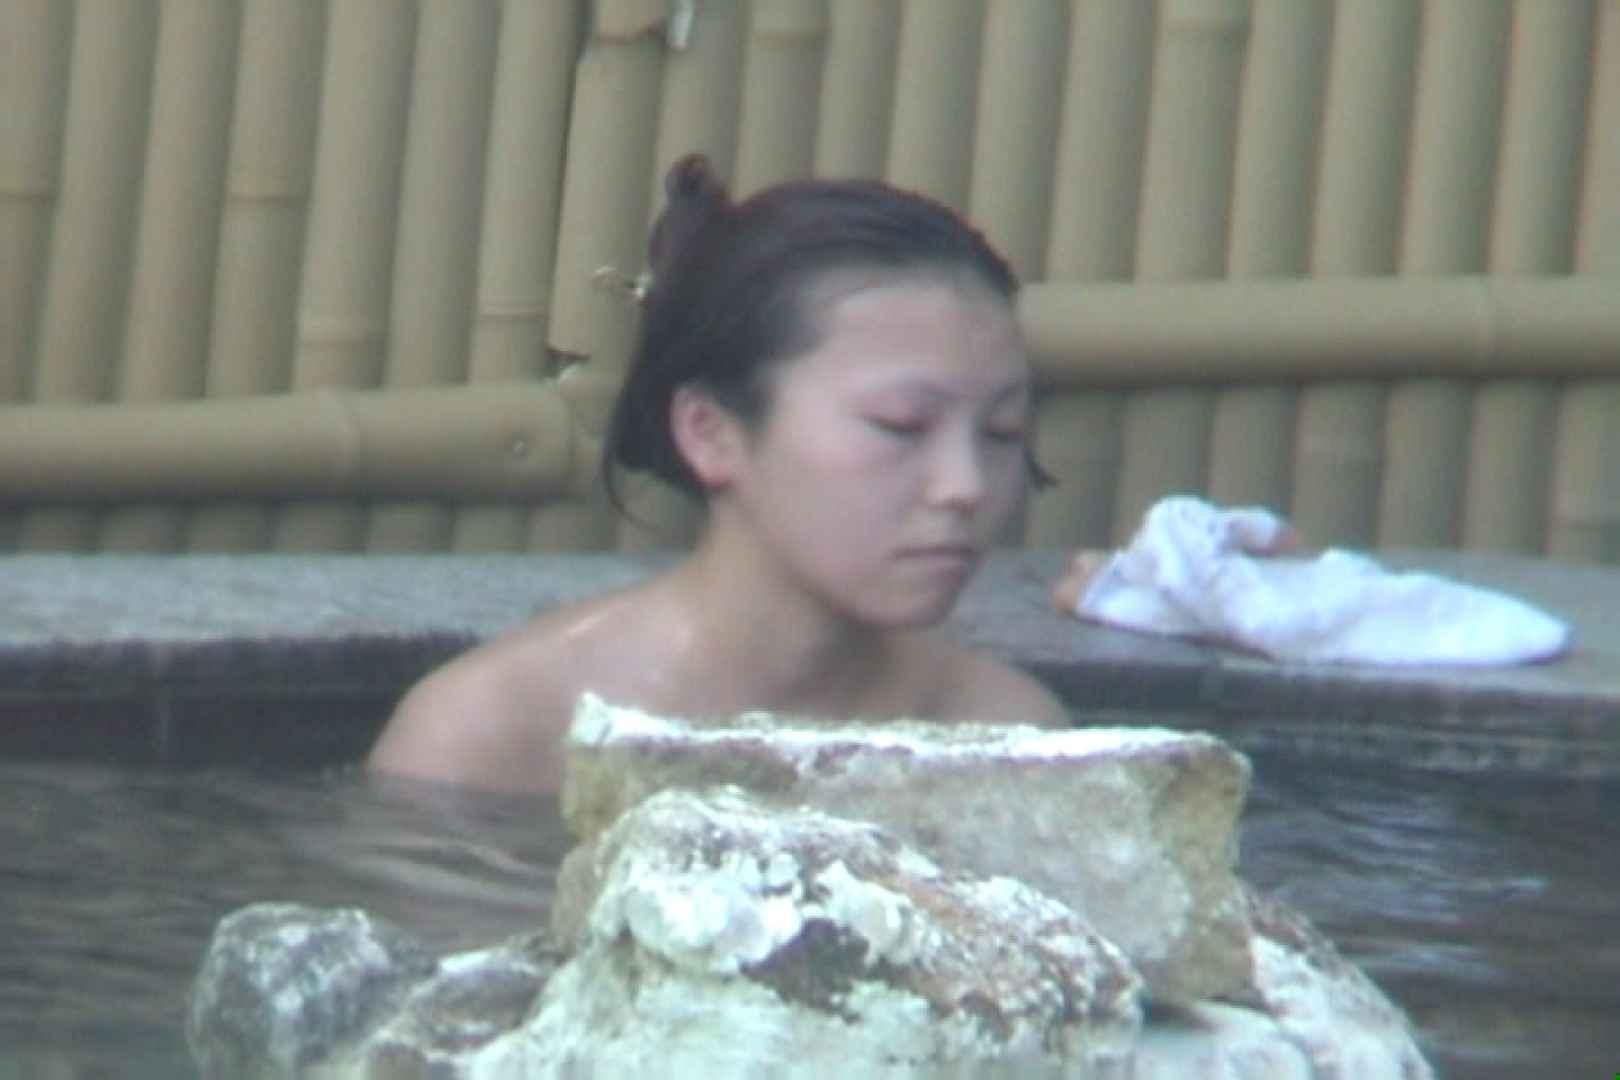 Aquaな露天風呂Vol.572 露天風呂編  93PIX 8